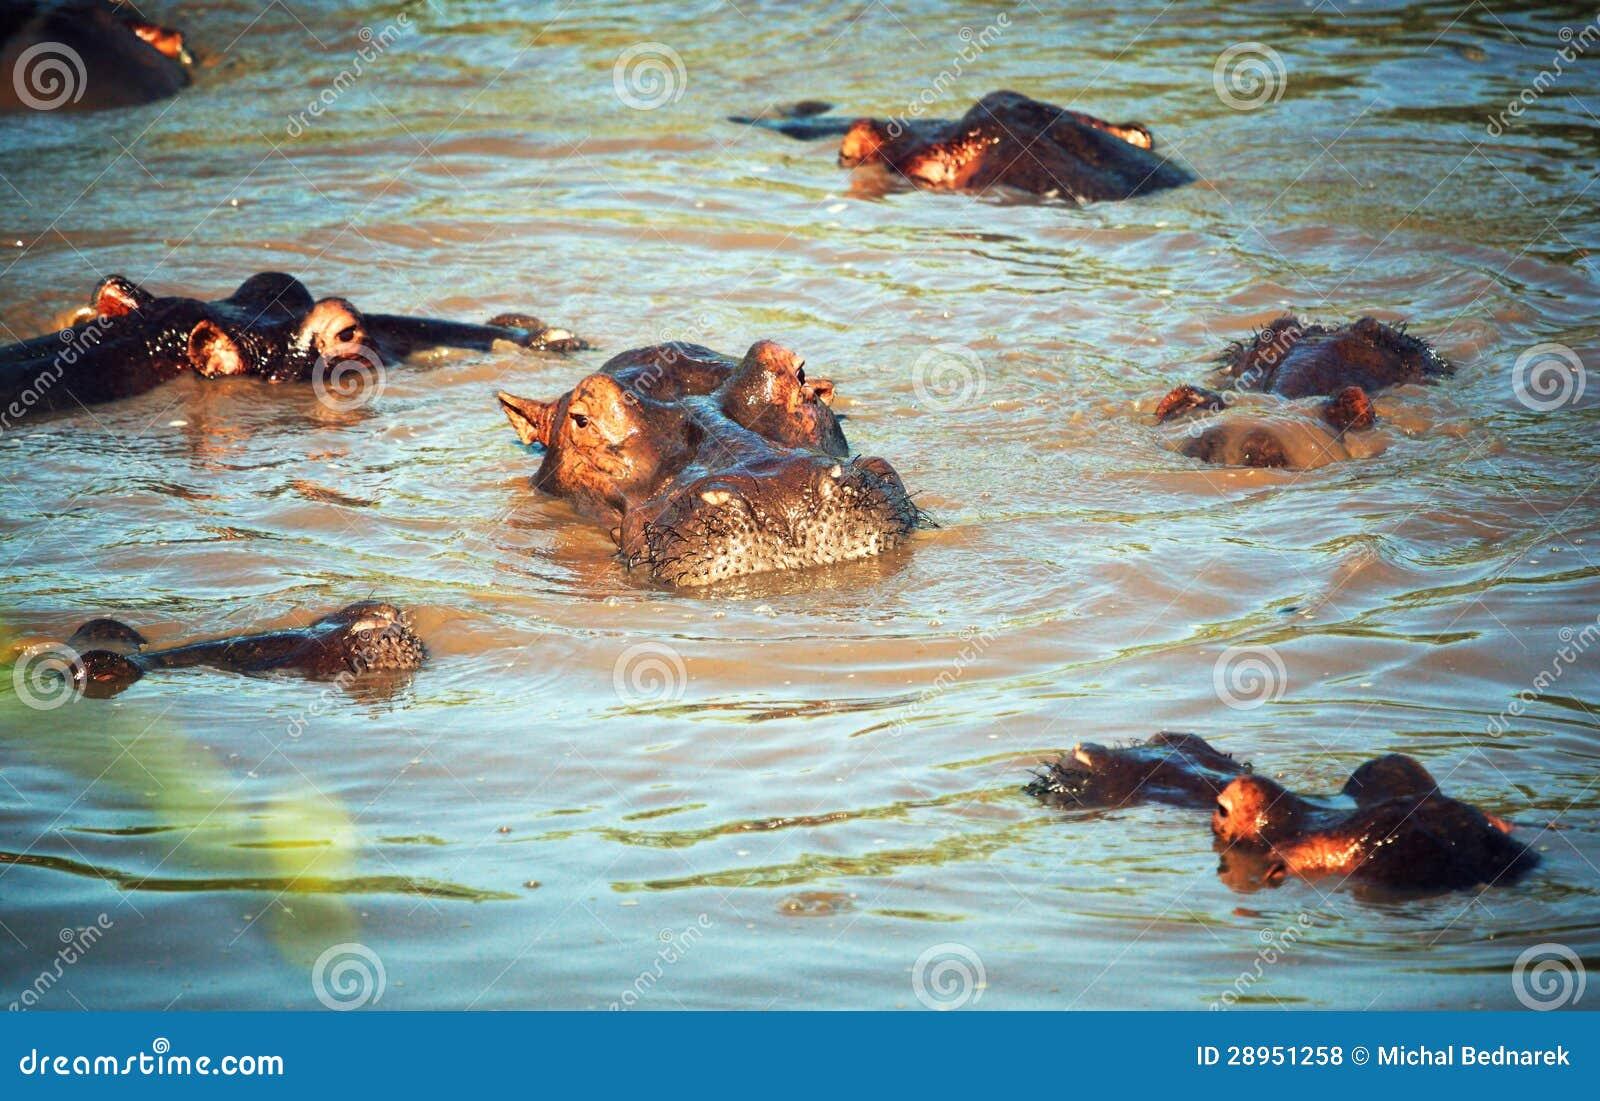 Hipopotam, hipopotam grupa w rzece. Serengeti, Tanzania, Afryka